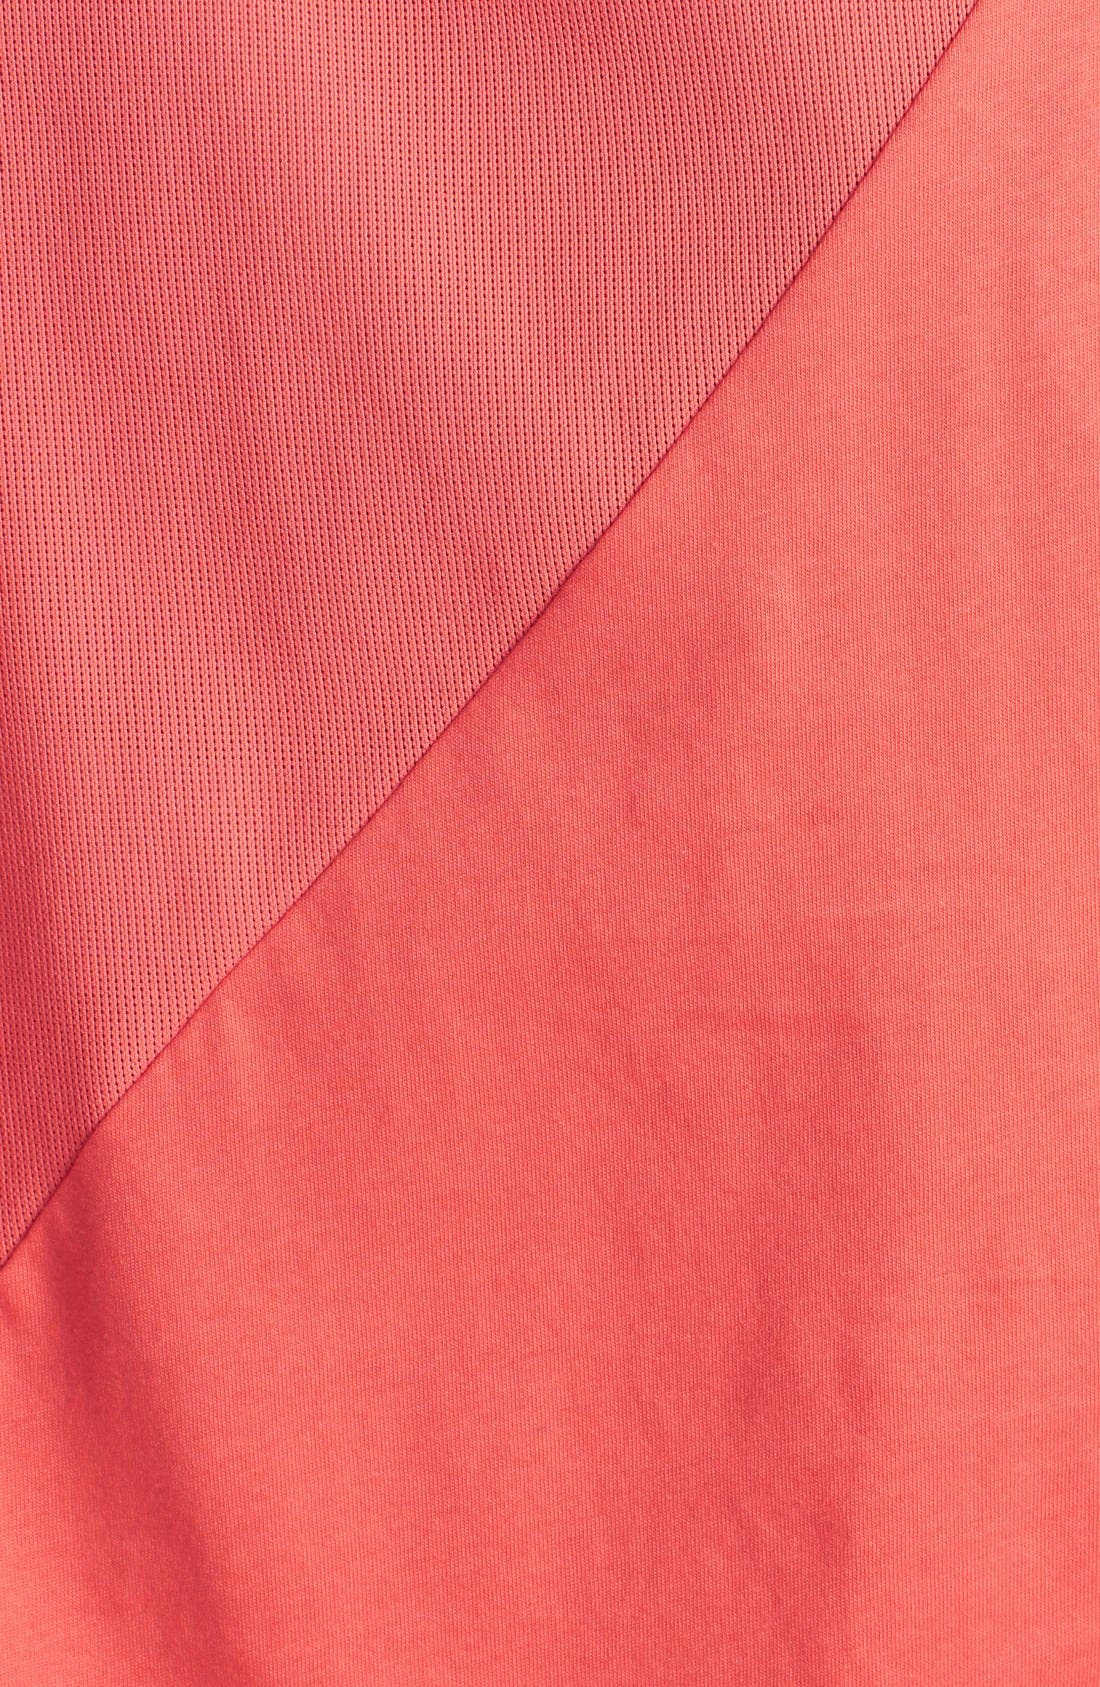 Alternate Image 3  - adidas by Stella McCartney 'Yoga Loose' High/Low Crop Tee